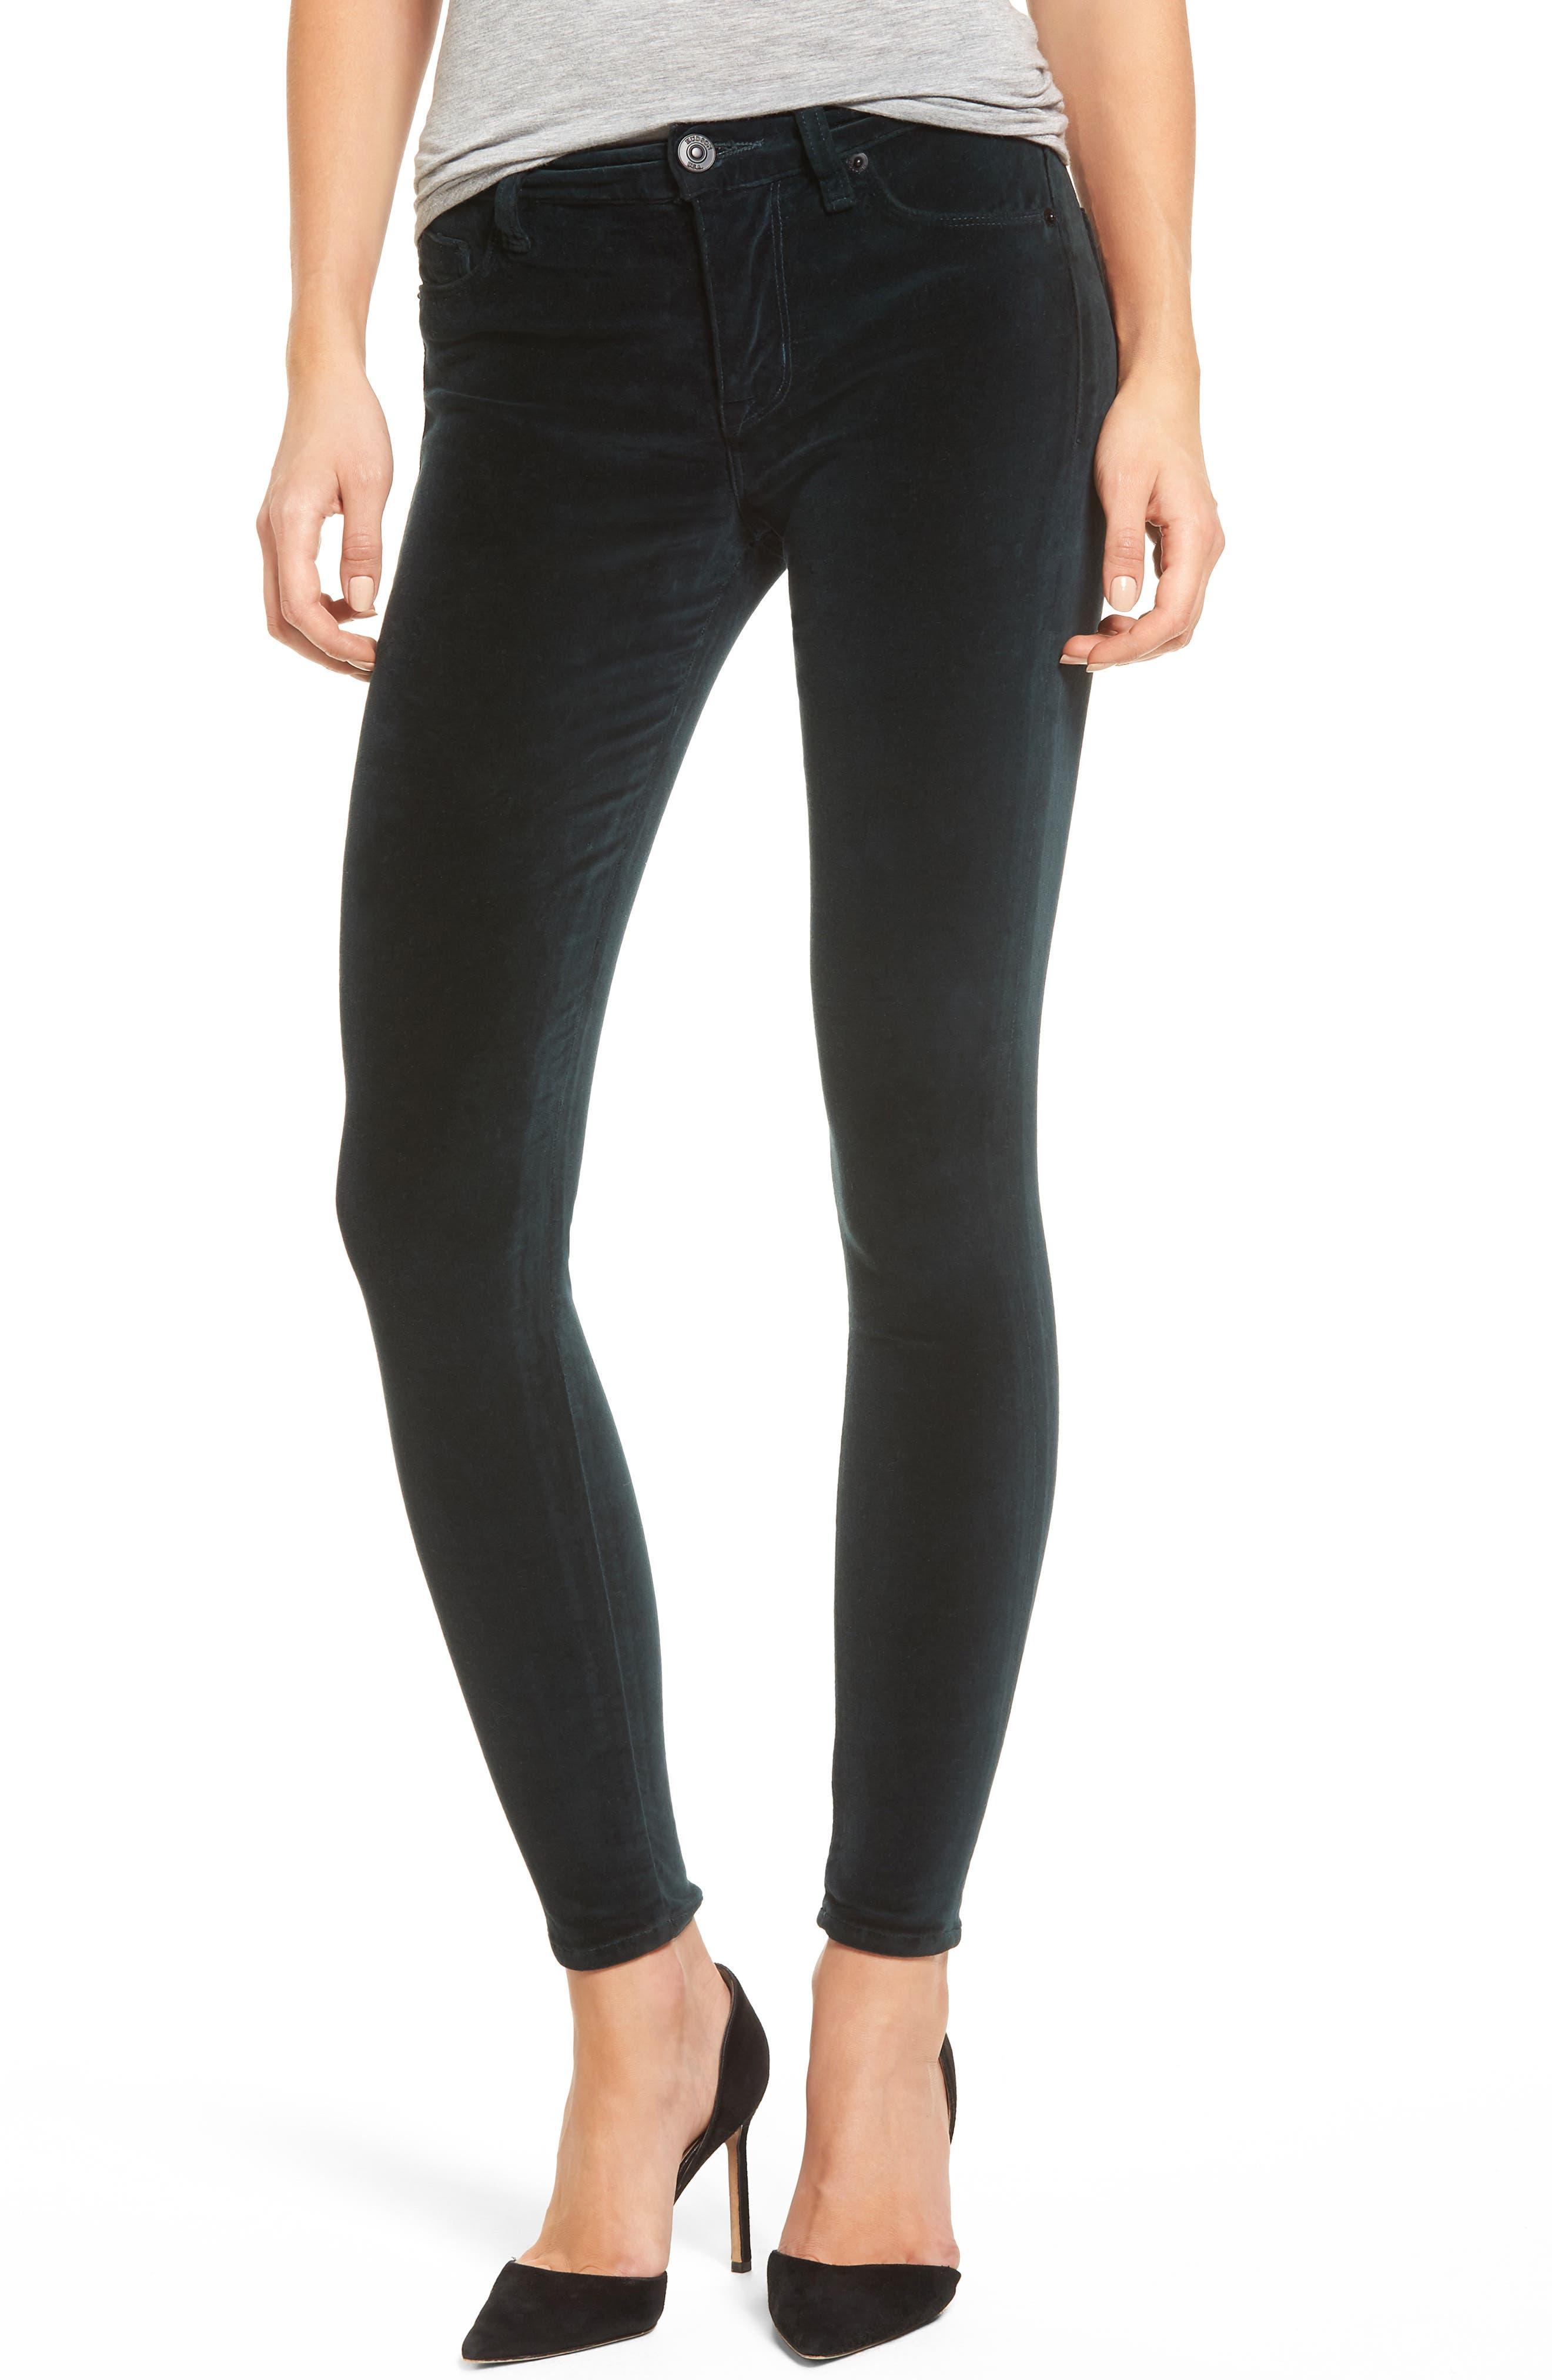 Main Image - Hudson Jeans Barbara High Waist Ankle Super Skinny Jeans